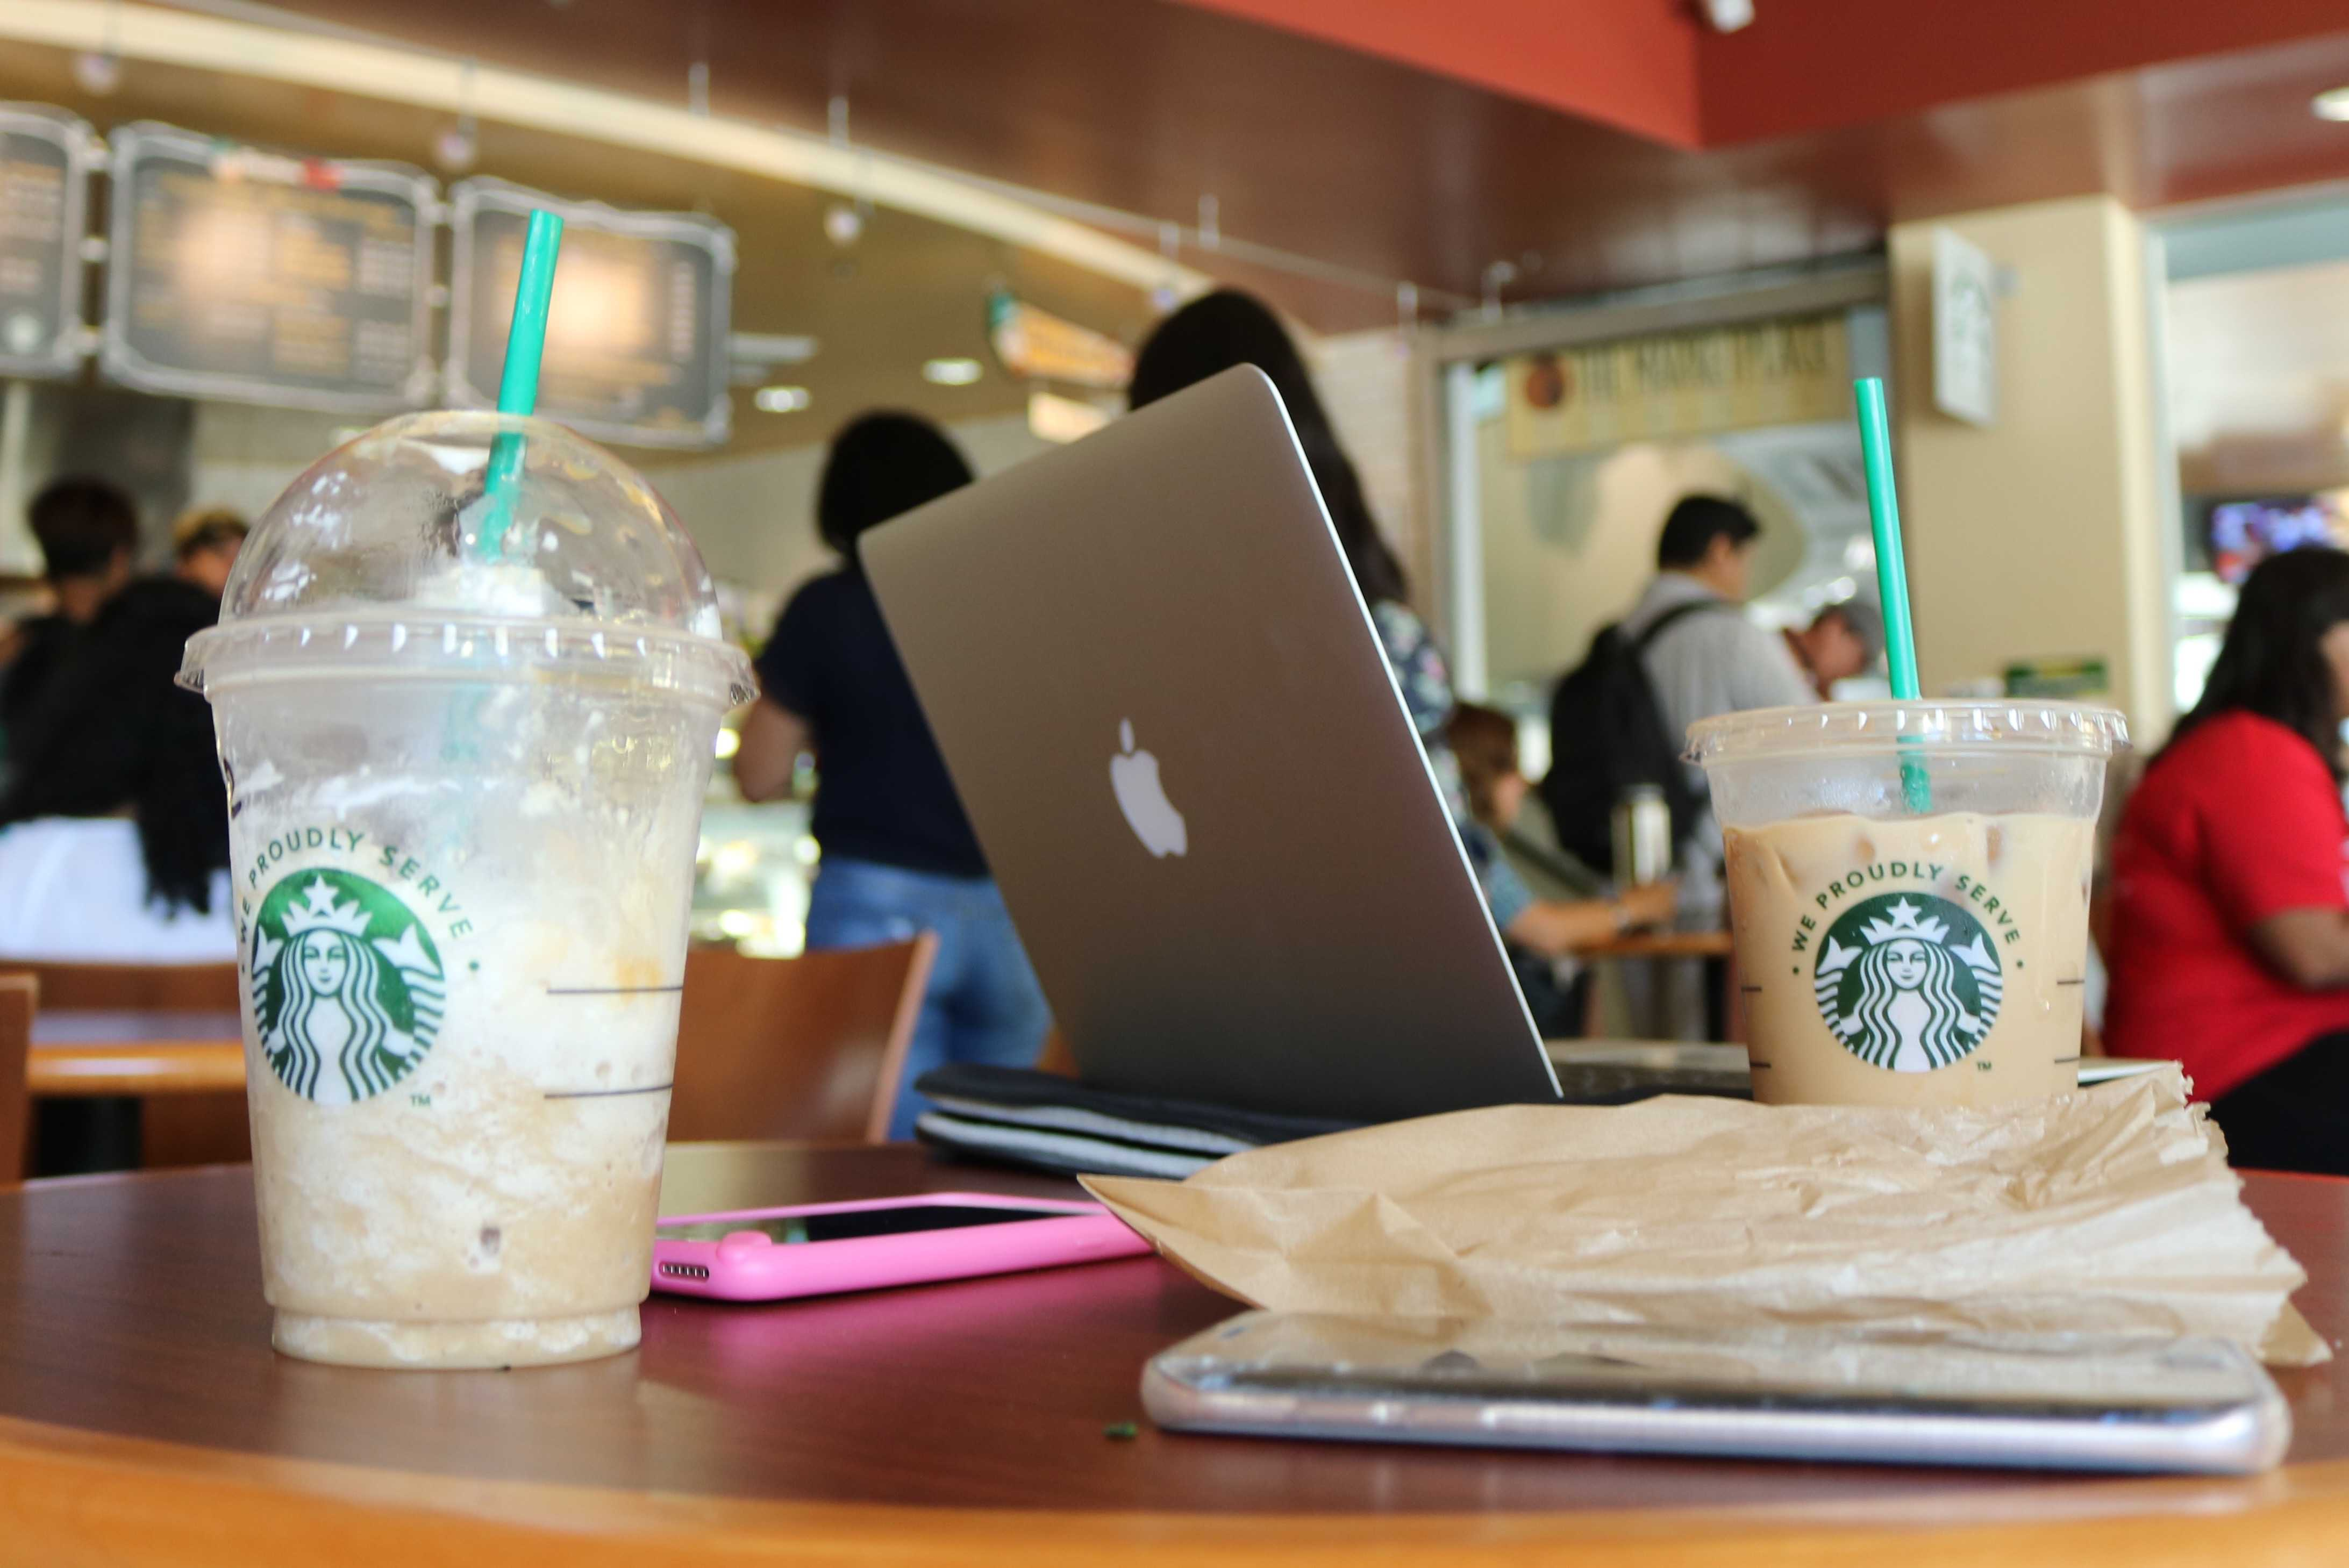 Currently, CSUN serves Starbucks only at the Sierra Center Photo credit: Kianna Hendricks